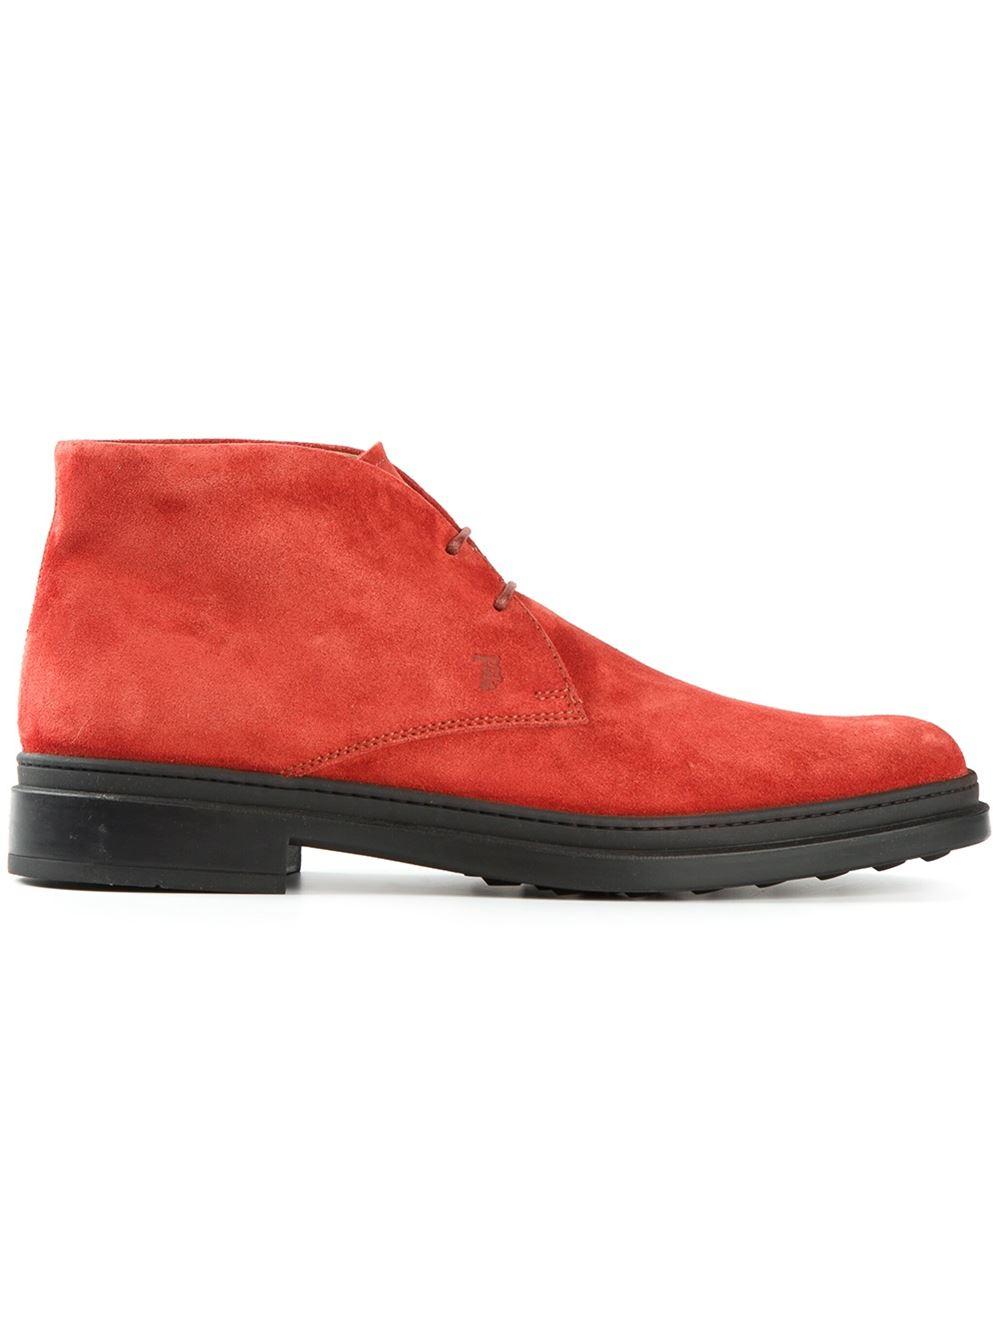 tod 39 s classic desert boots in orange for men yellow orange lyst. Black Bedroom Furniture Sets. Home Design Ideas